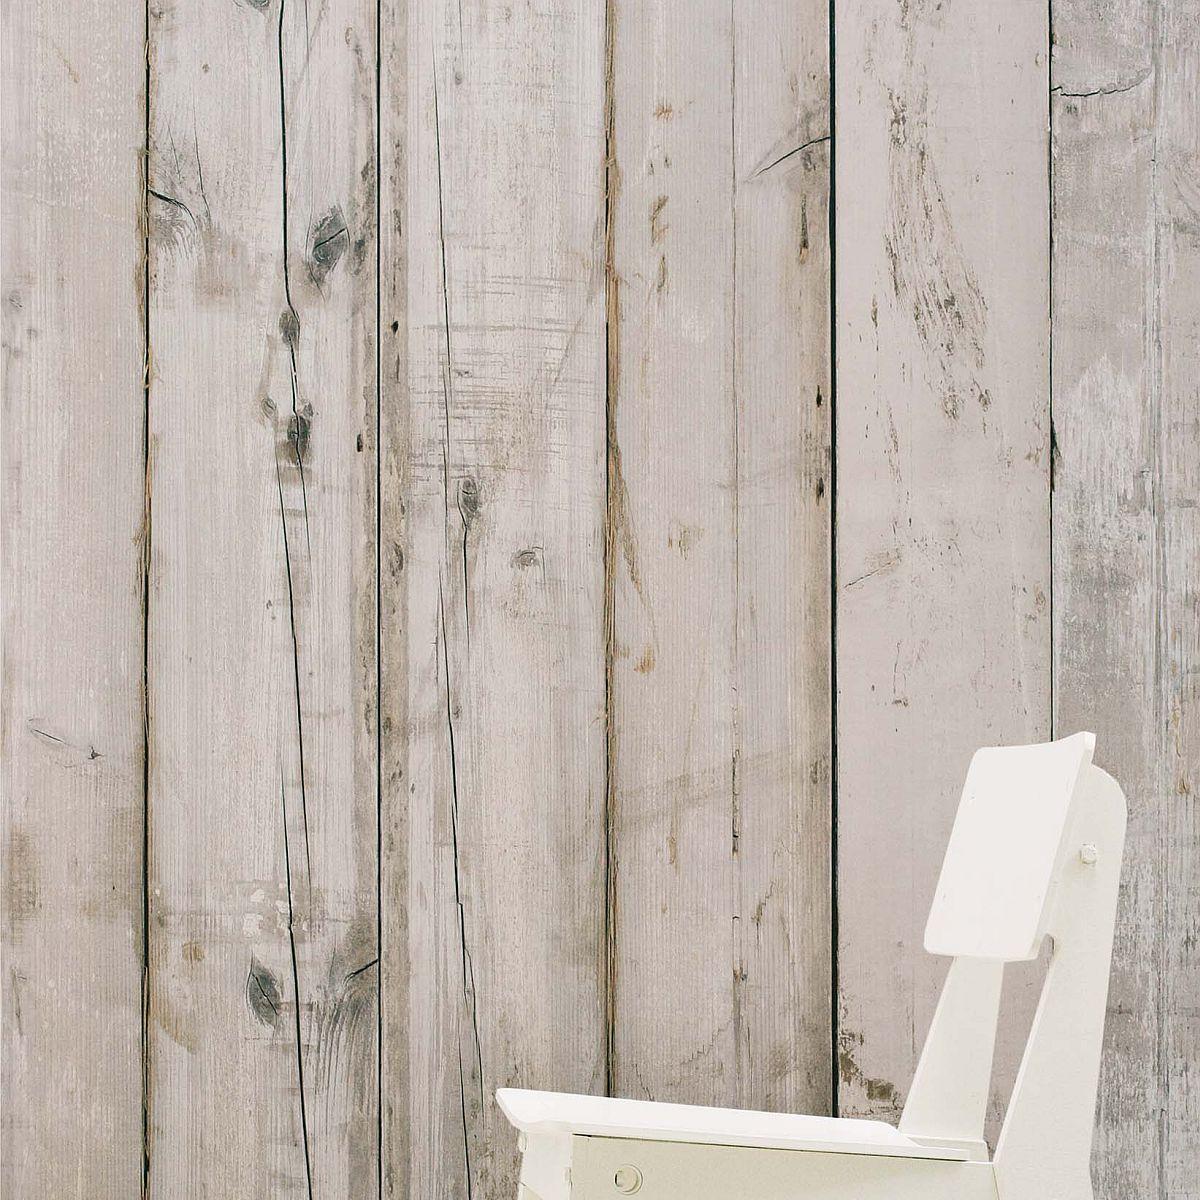 hochwertige tapeten und stoffe vintage tapete digitaldruck bretter phe 07 scrapwood. Black Bedroom Furniture Sets. Home Design Ideas